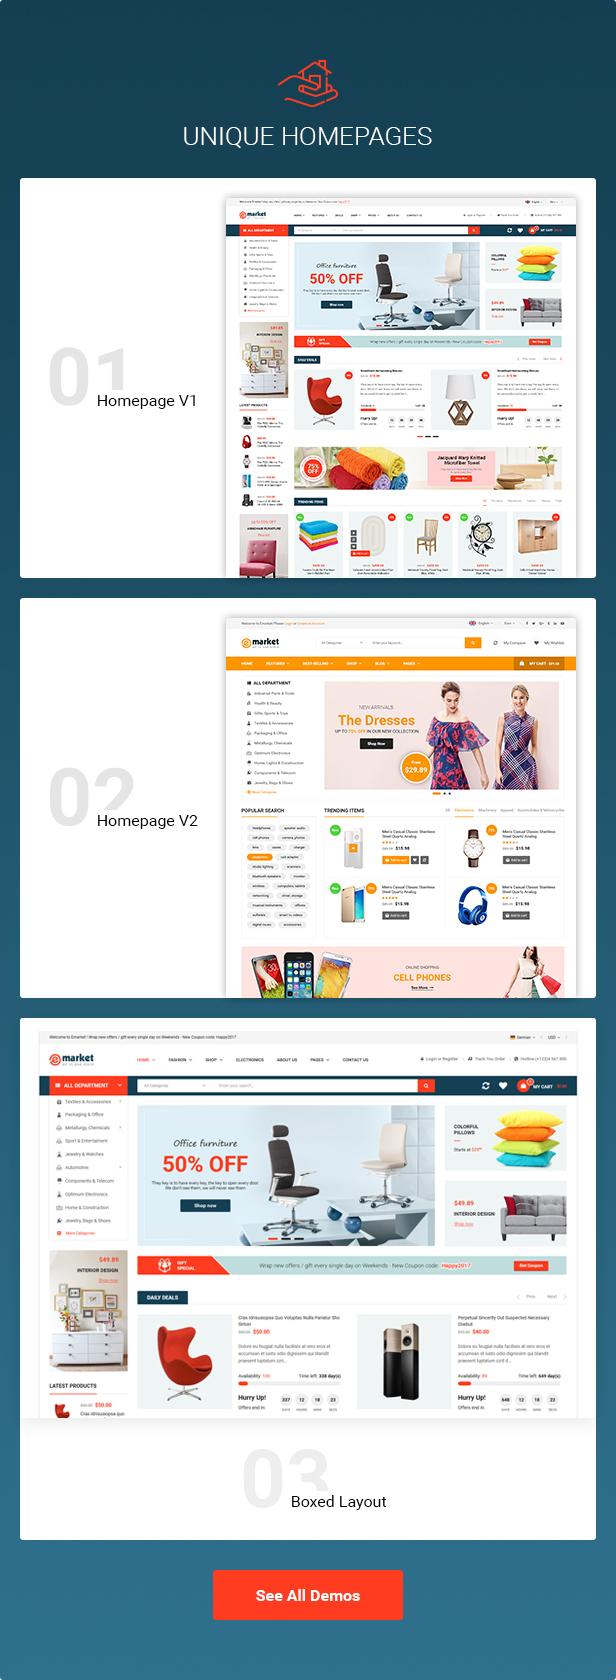 E-market - Stunning and Responsive Magento 2.1 Theme